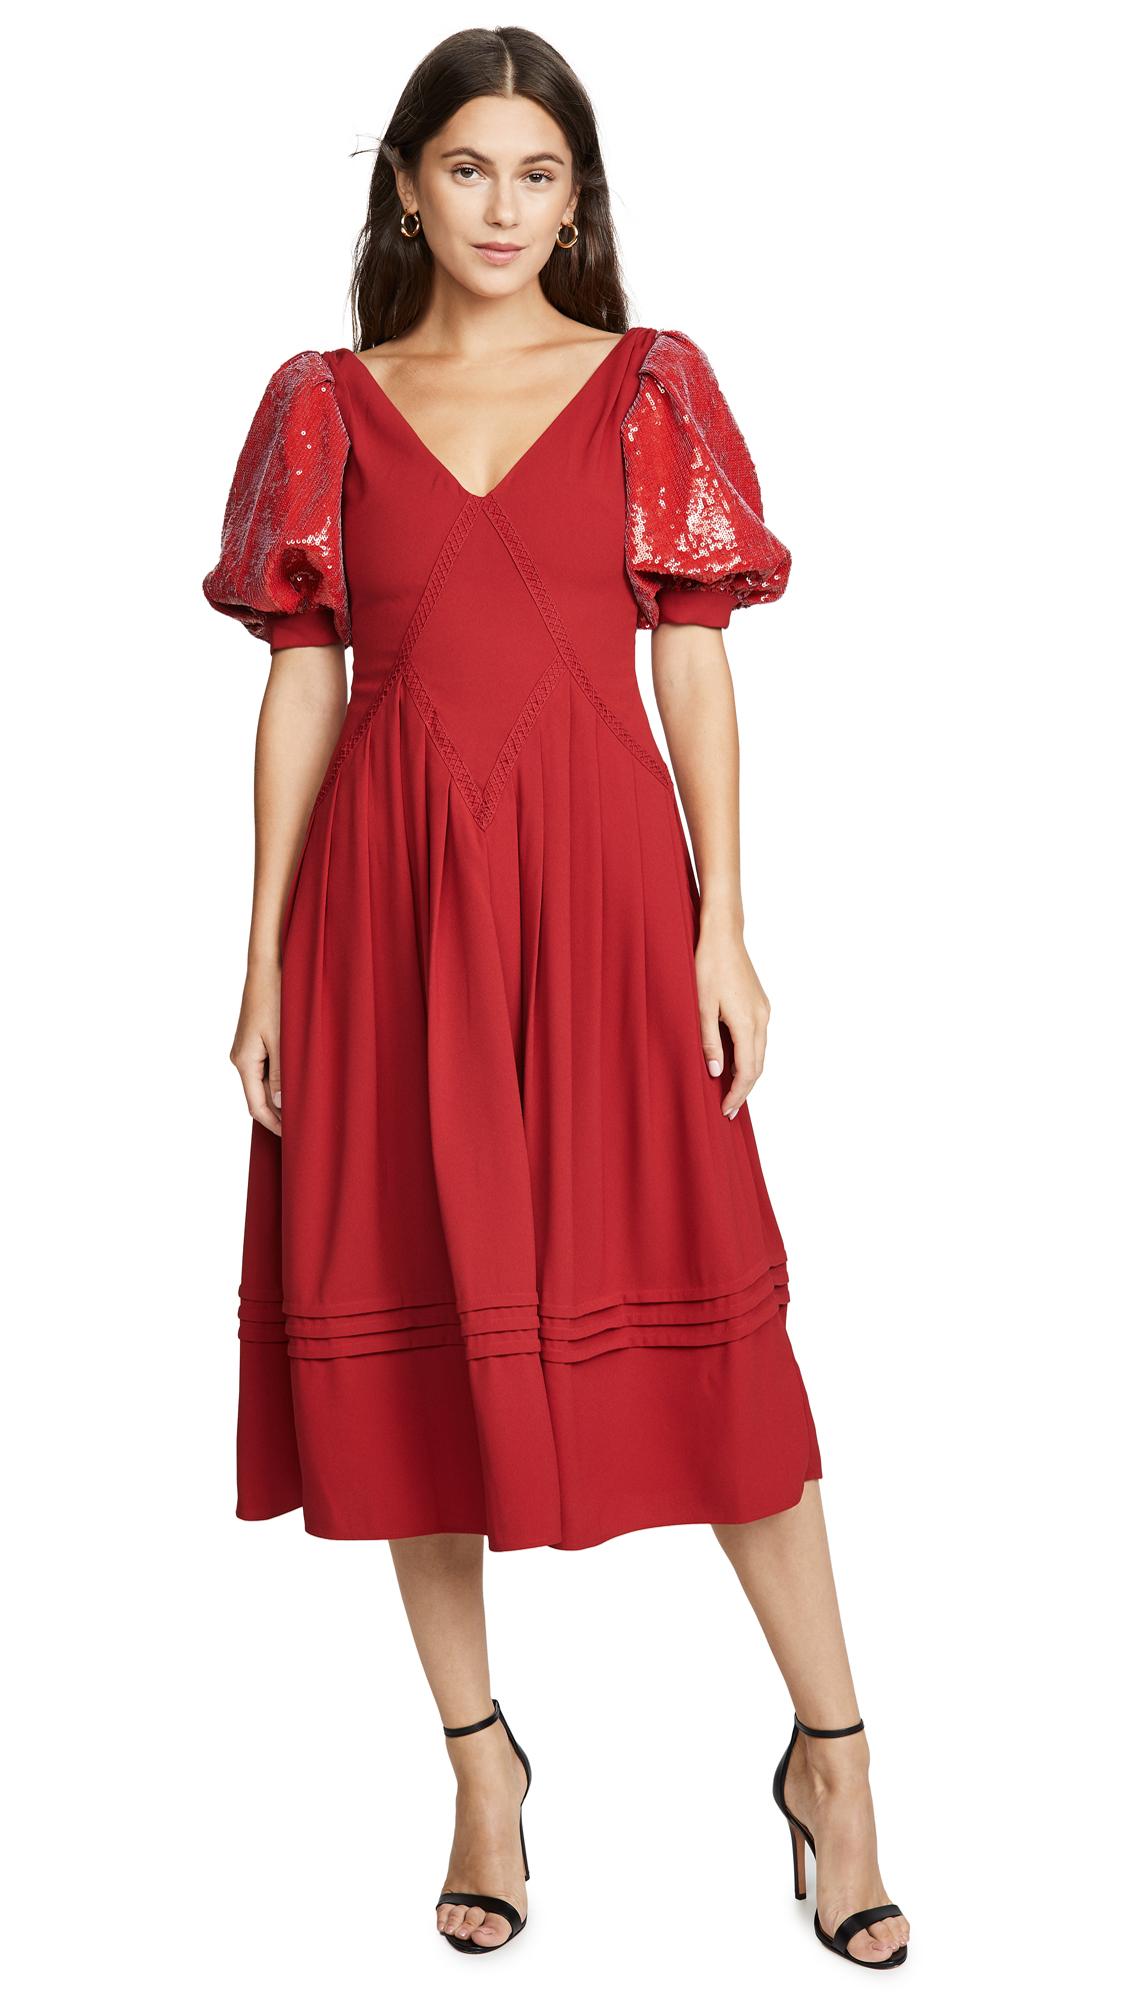 Self Portrait Red Sequin Short Sleeve Midi Dress - Dark Red